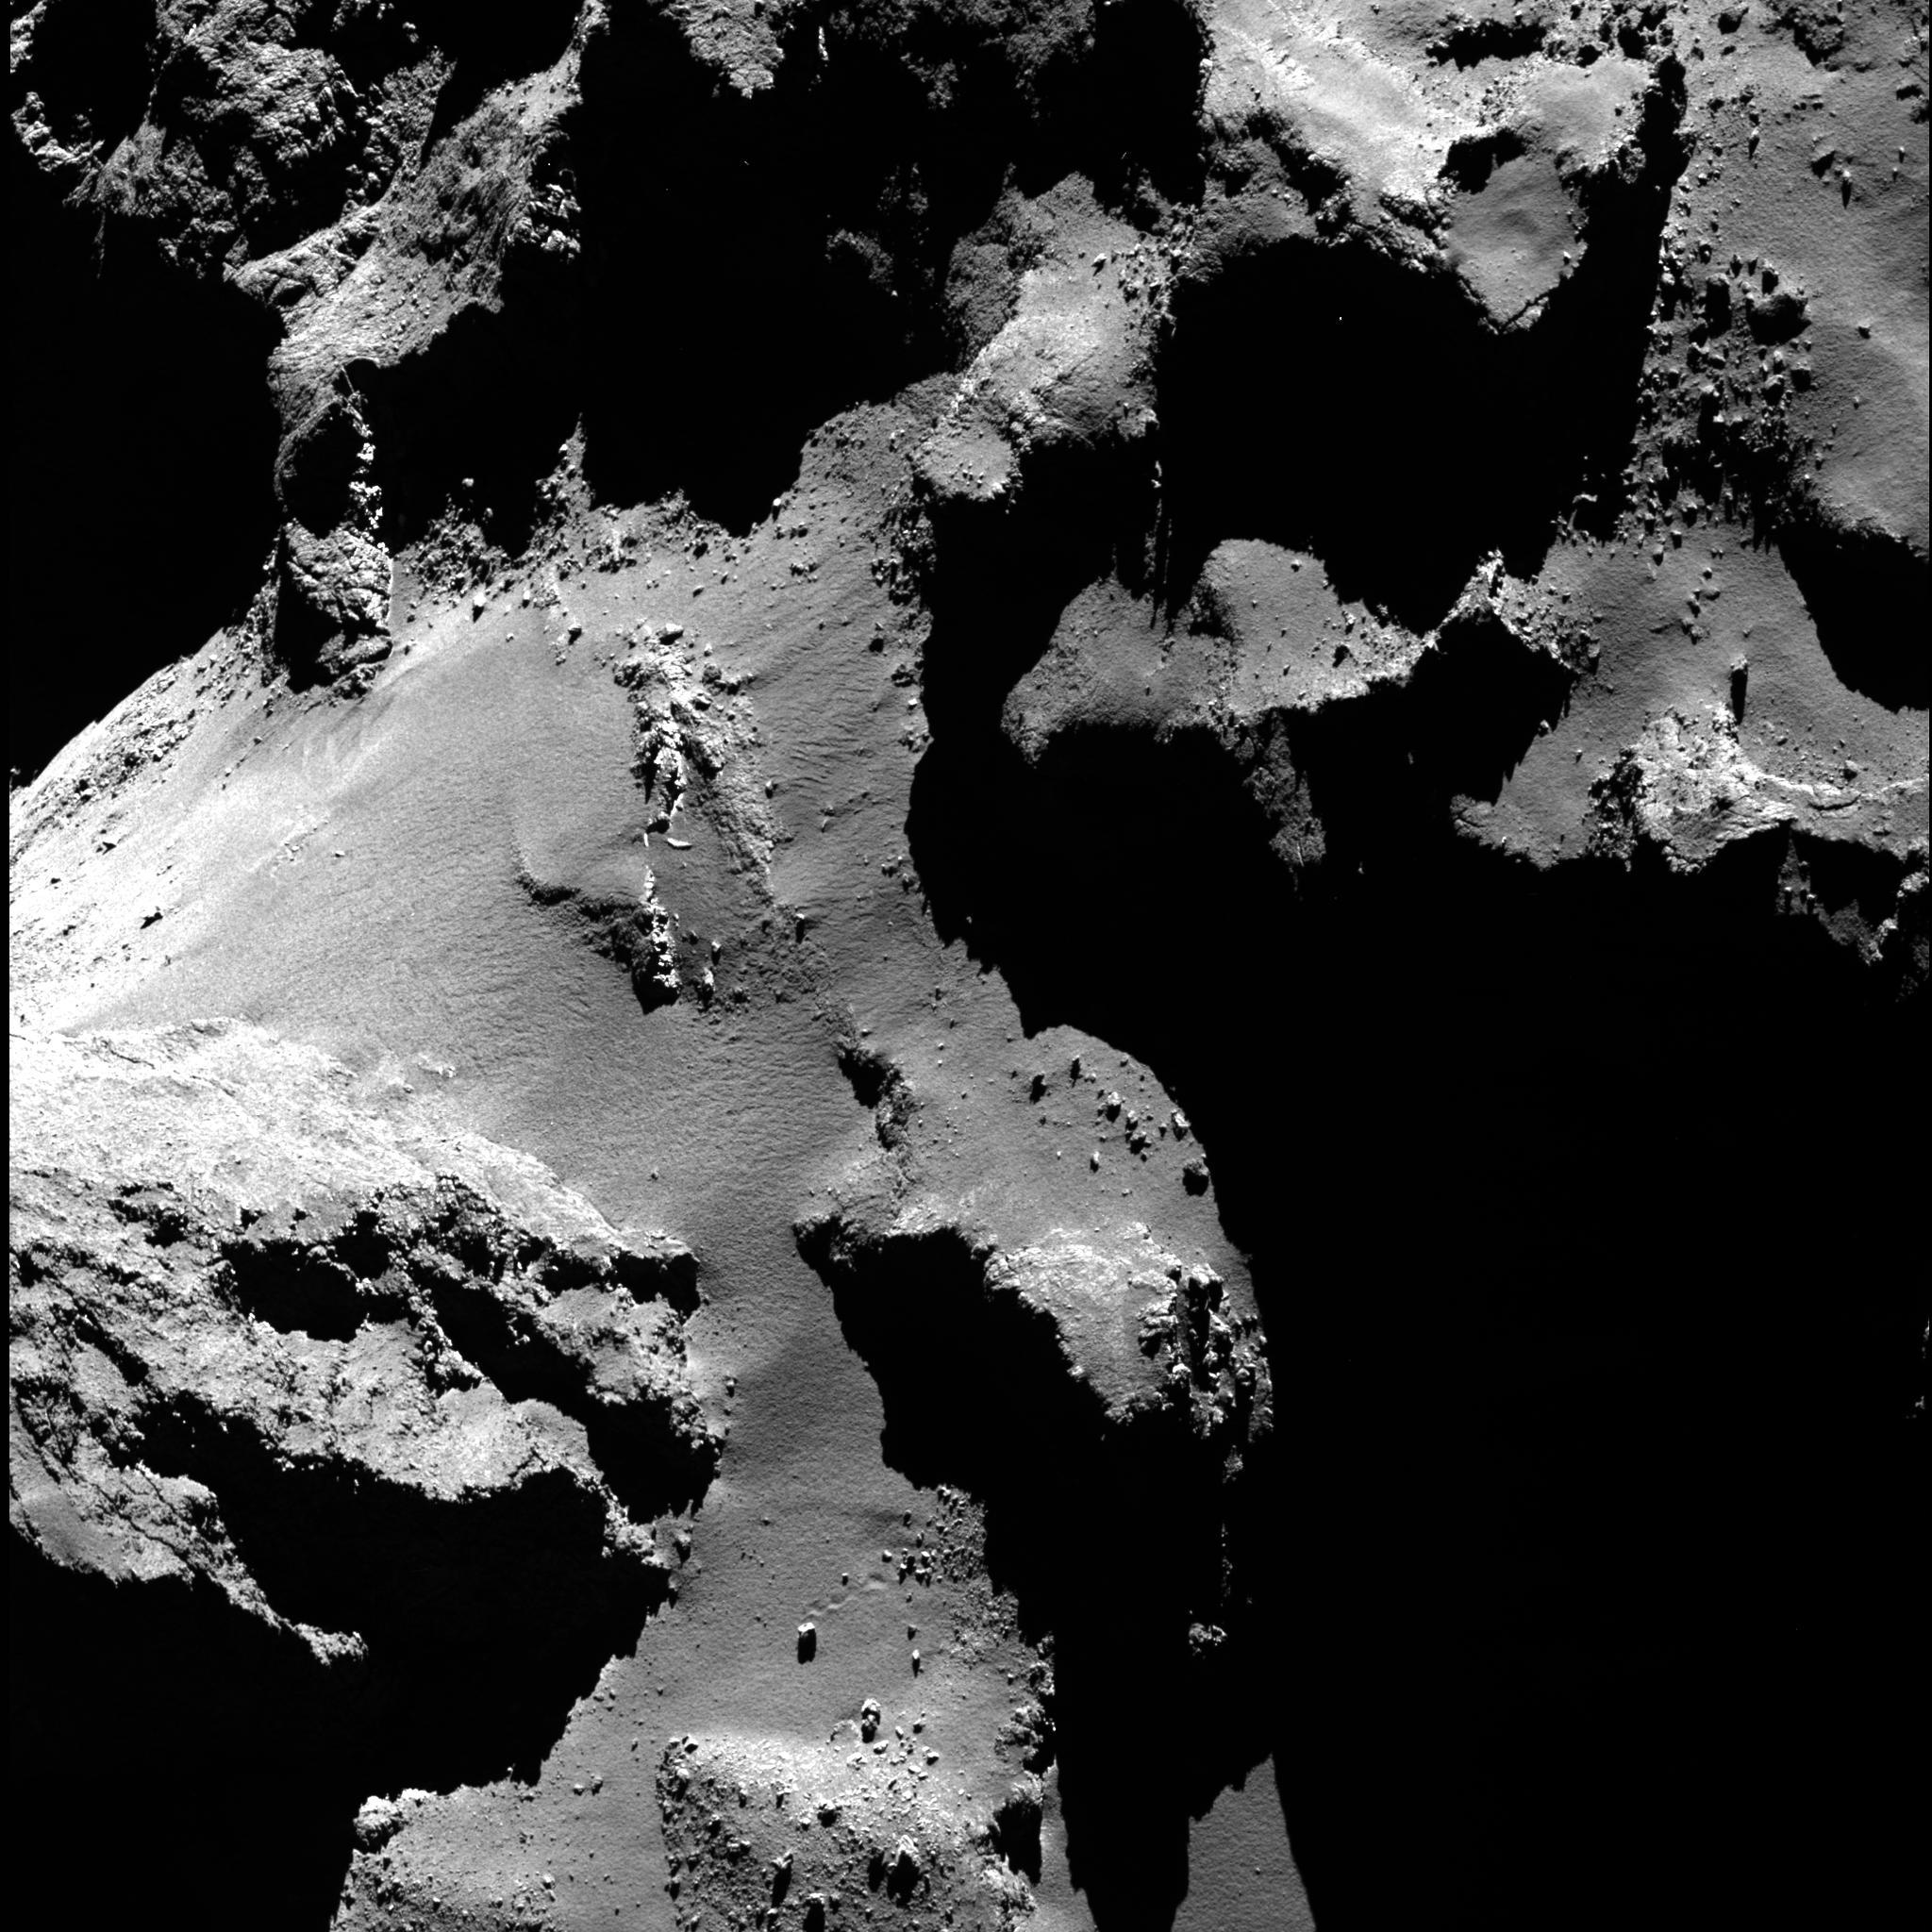 Rosetta : Mission autour de la comète 67P/Churyumov-Gerasimenko  - Page 33 Bounci10